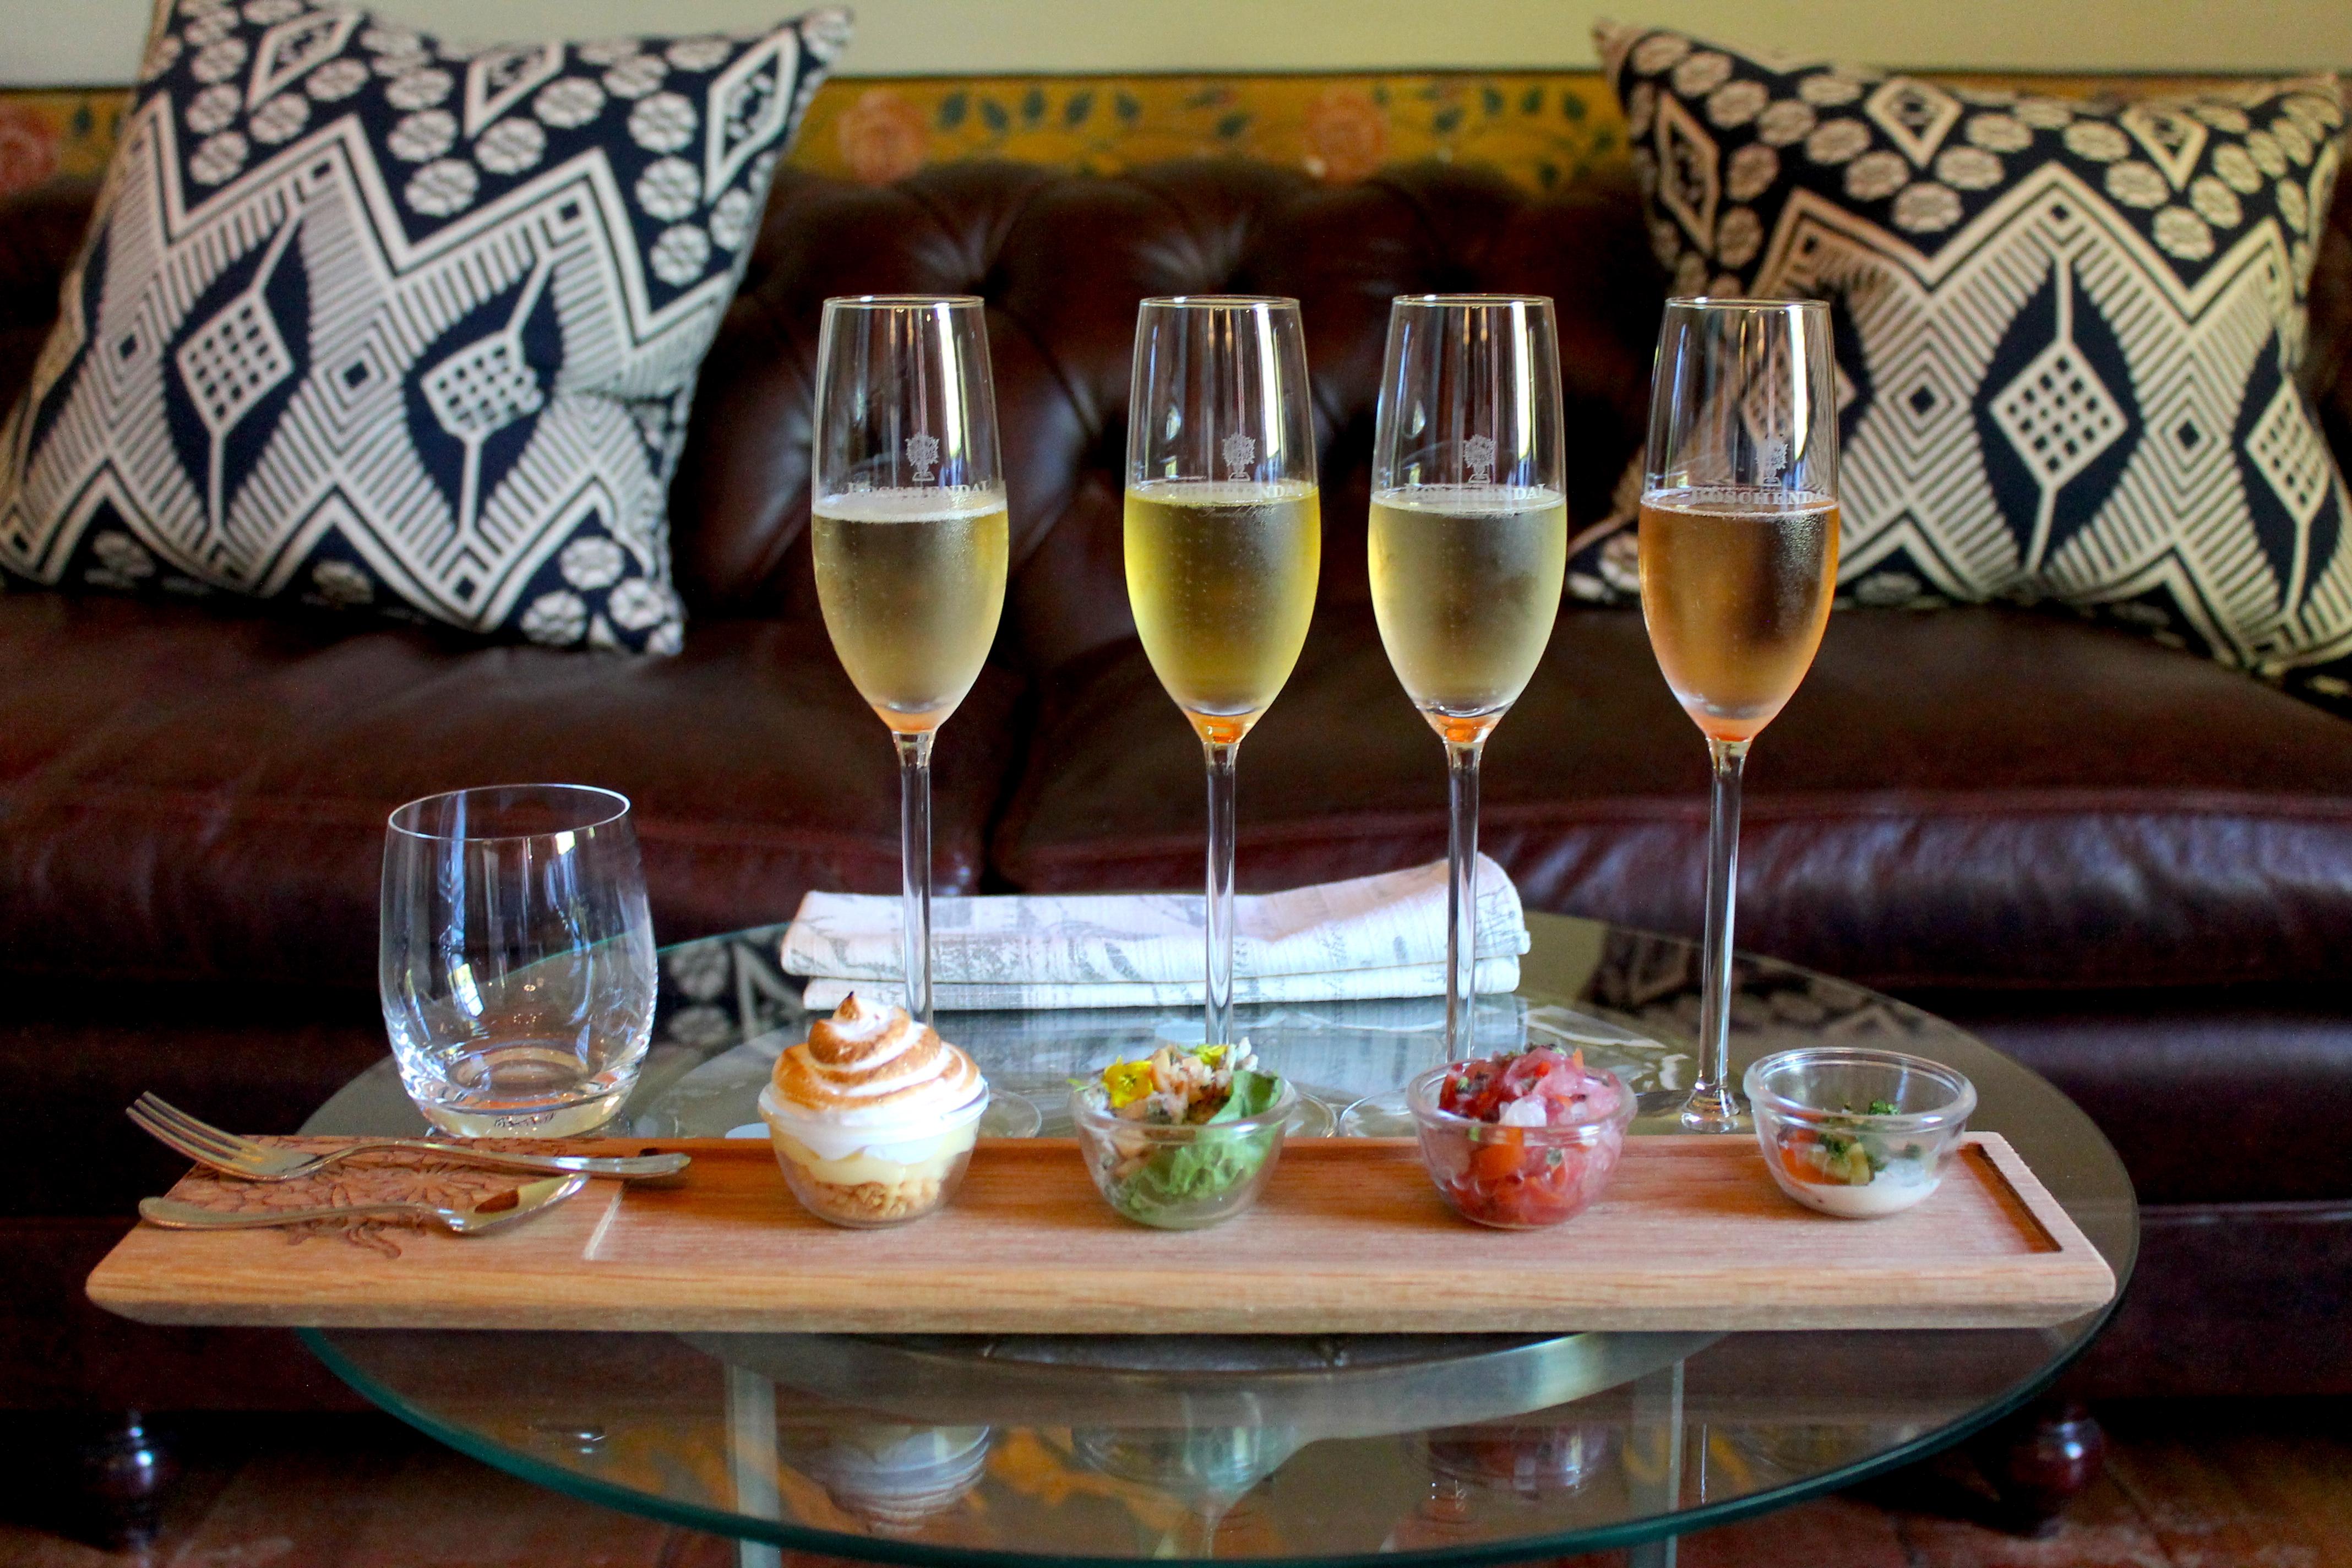 wine-tasting-boschendal-southafrica-lustforthesublime